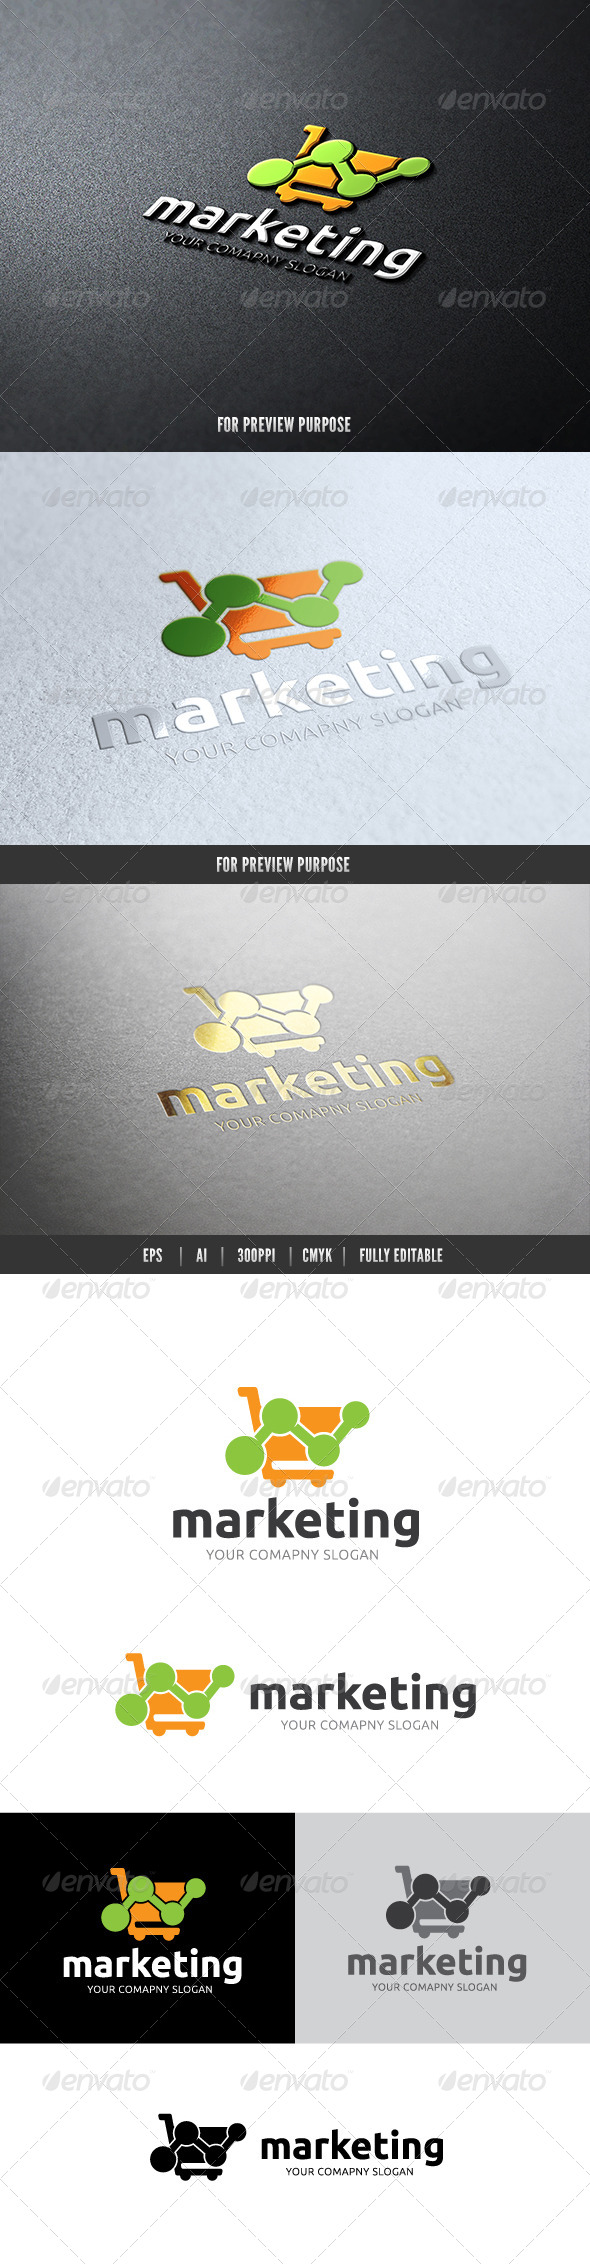 GraphicRiver Marketing Cloud II 7242016